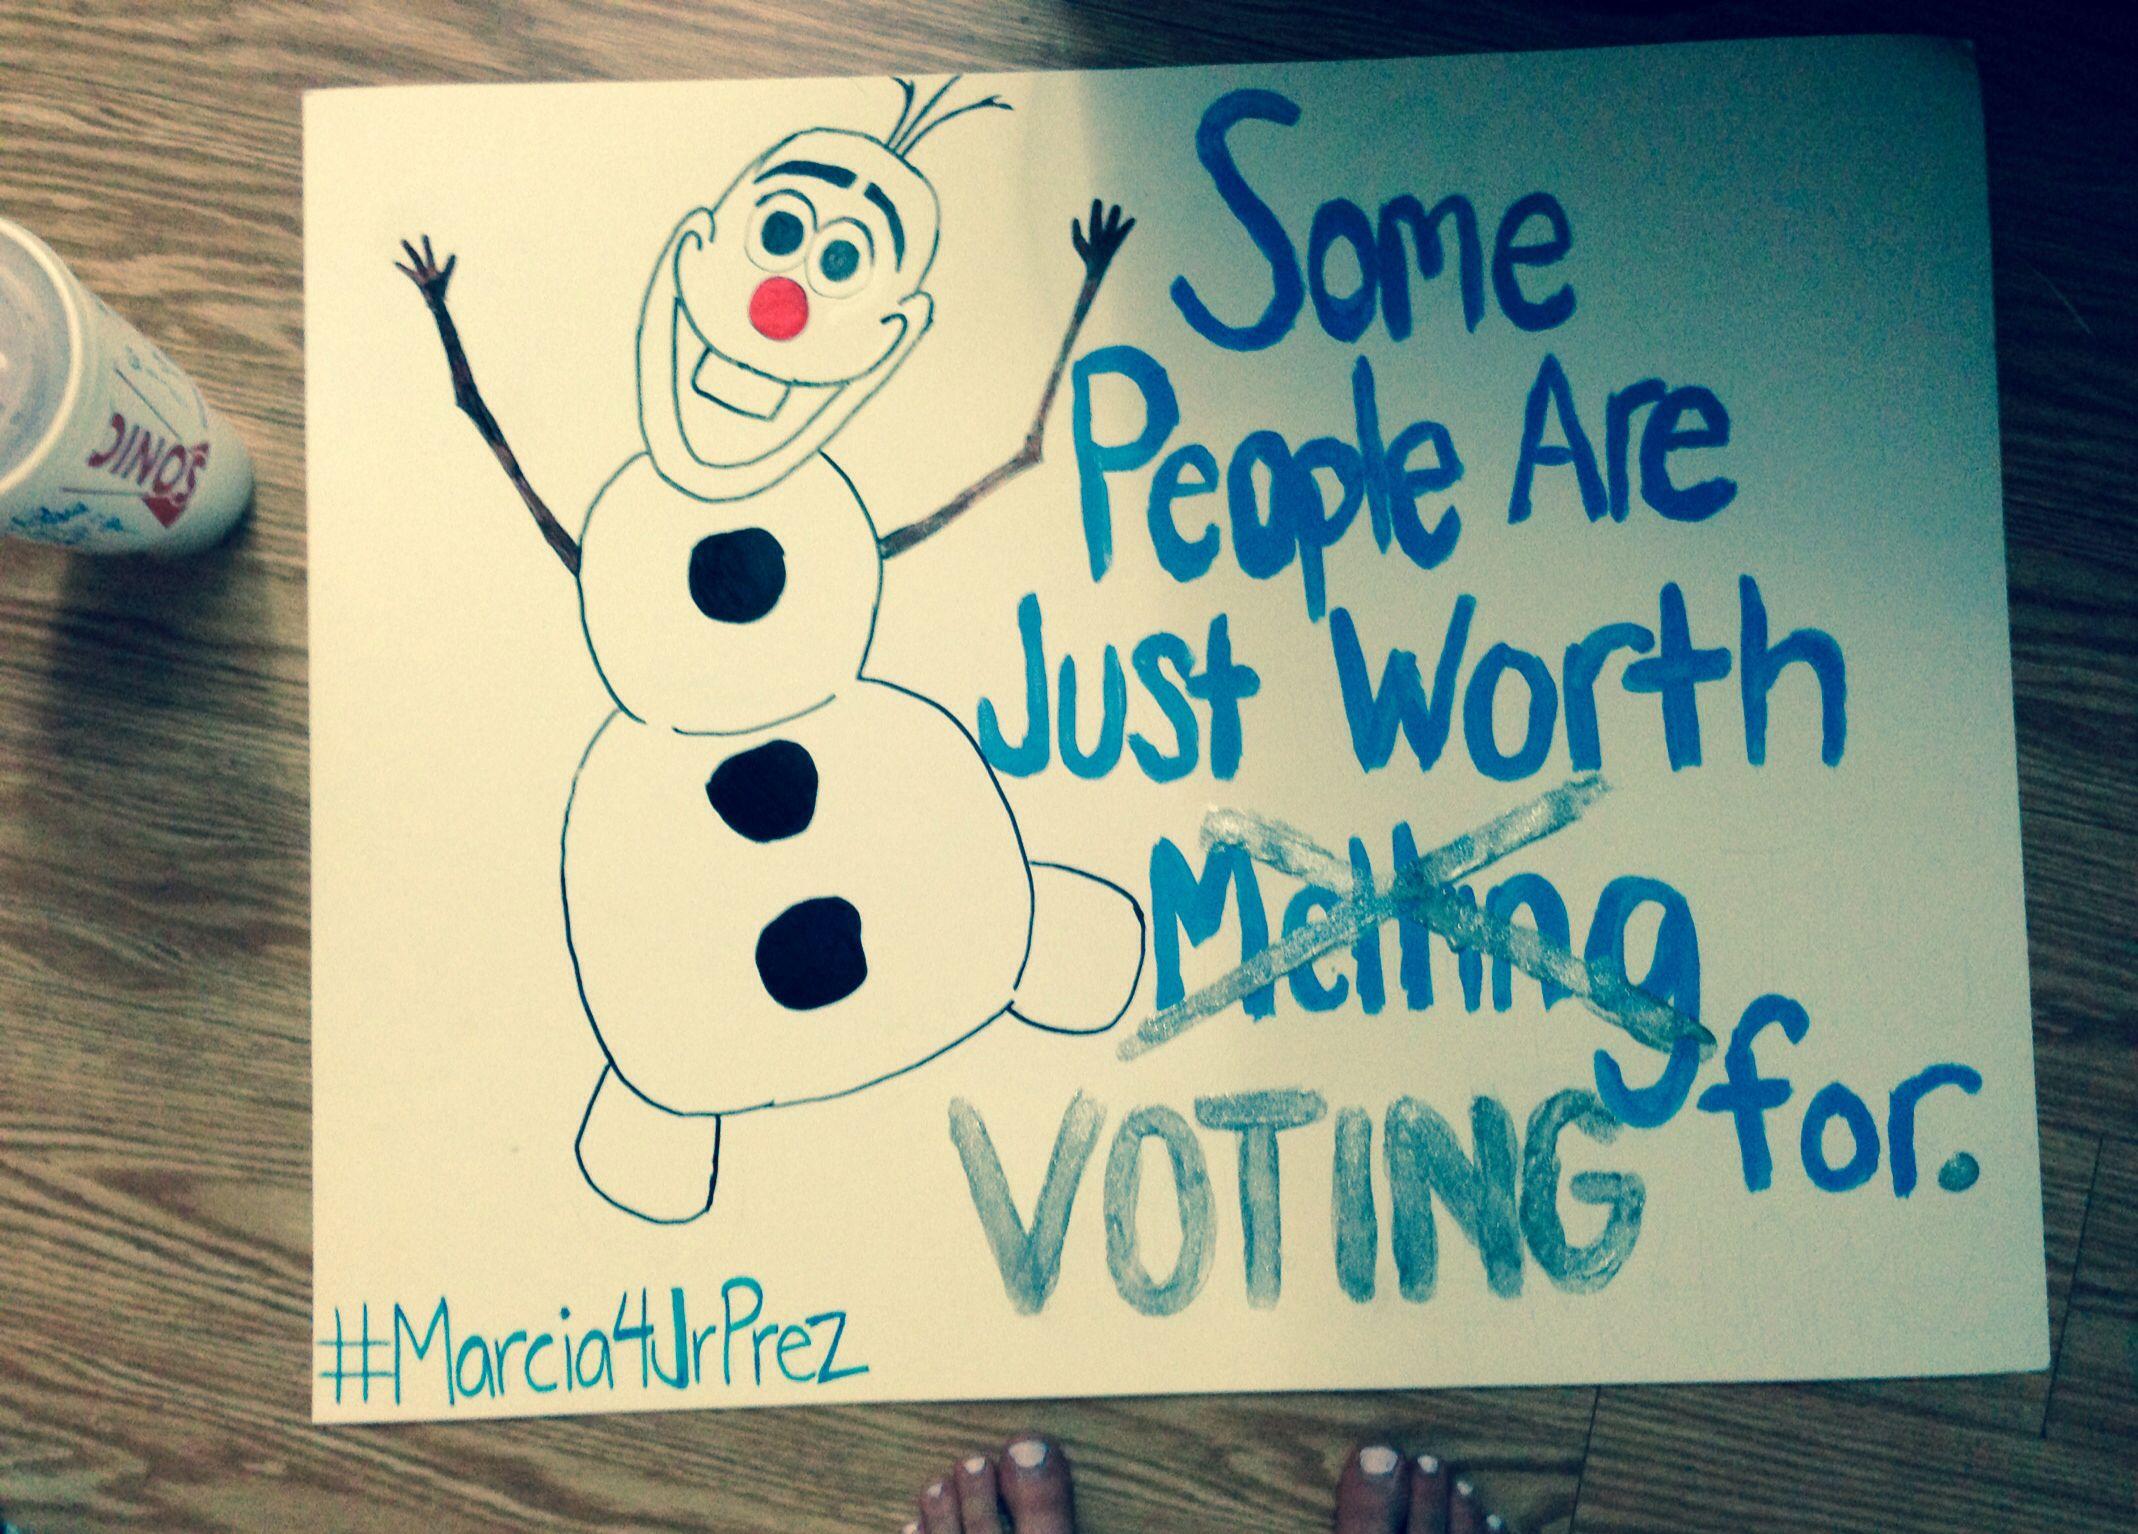 17 Best ideas about Student Council Campaign on Pinterest ...